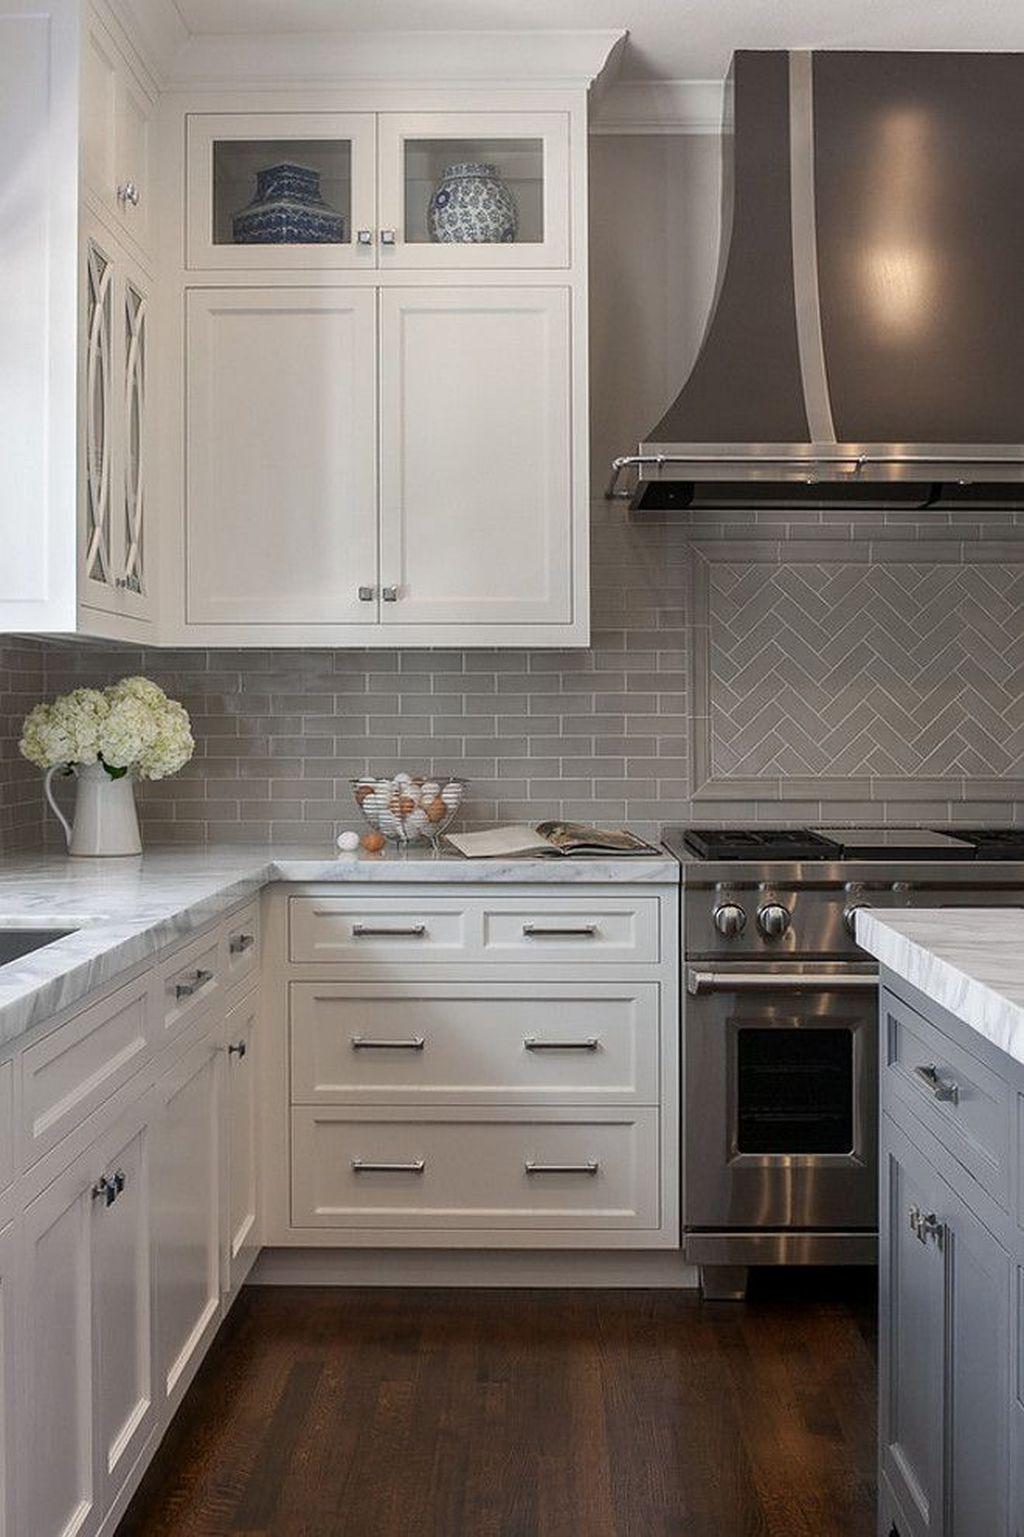 30 Amazing Kitchen Backsplash Design Ideas You Must Have Kitchen Backsplash Designs Kitchen Design Kitchen Remodel